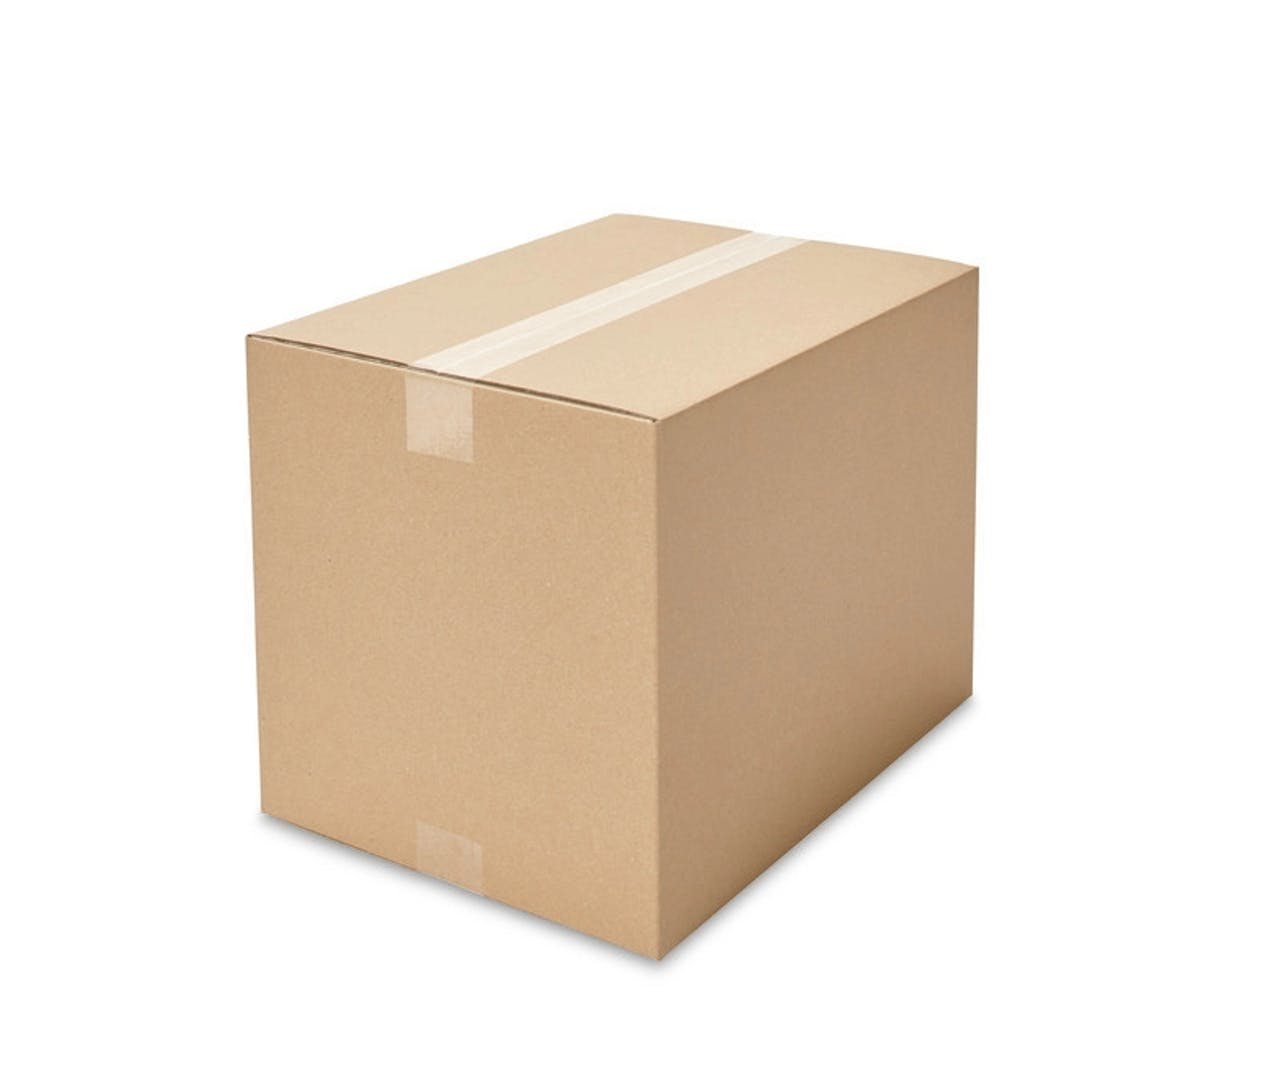 Wellpapp-Faltkartons ECONOMY, Länge 350 bis 399 mm, VAR: eke161